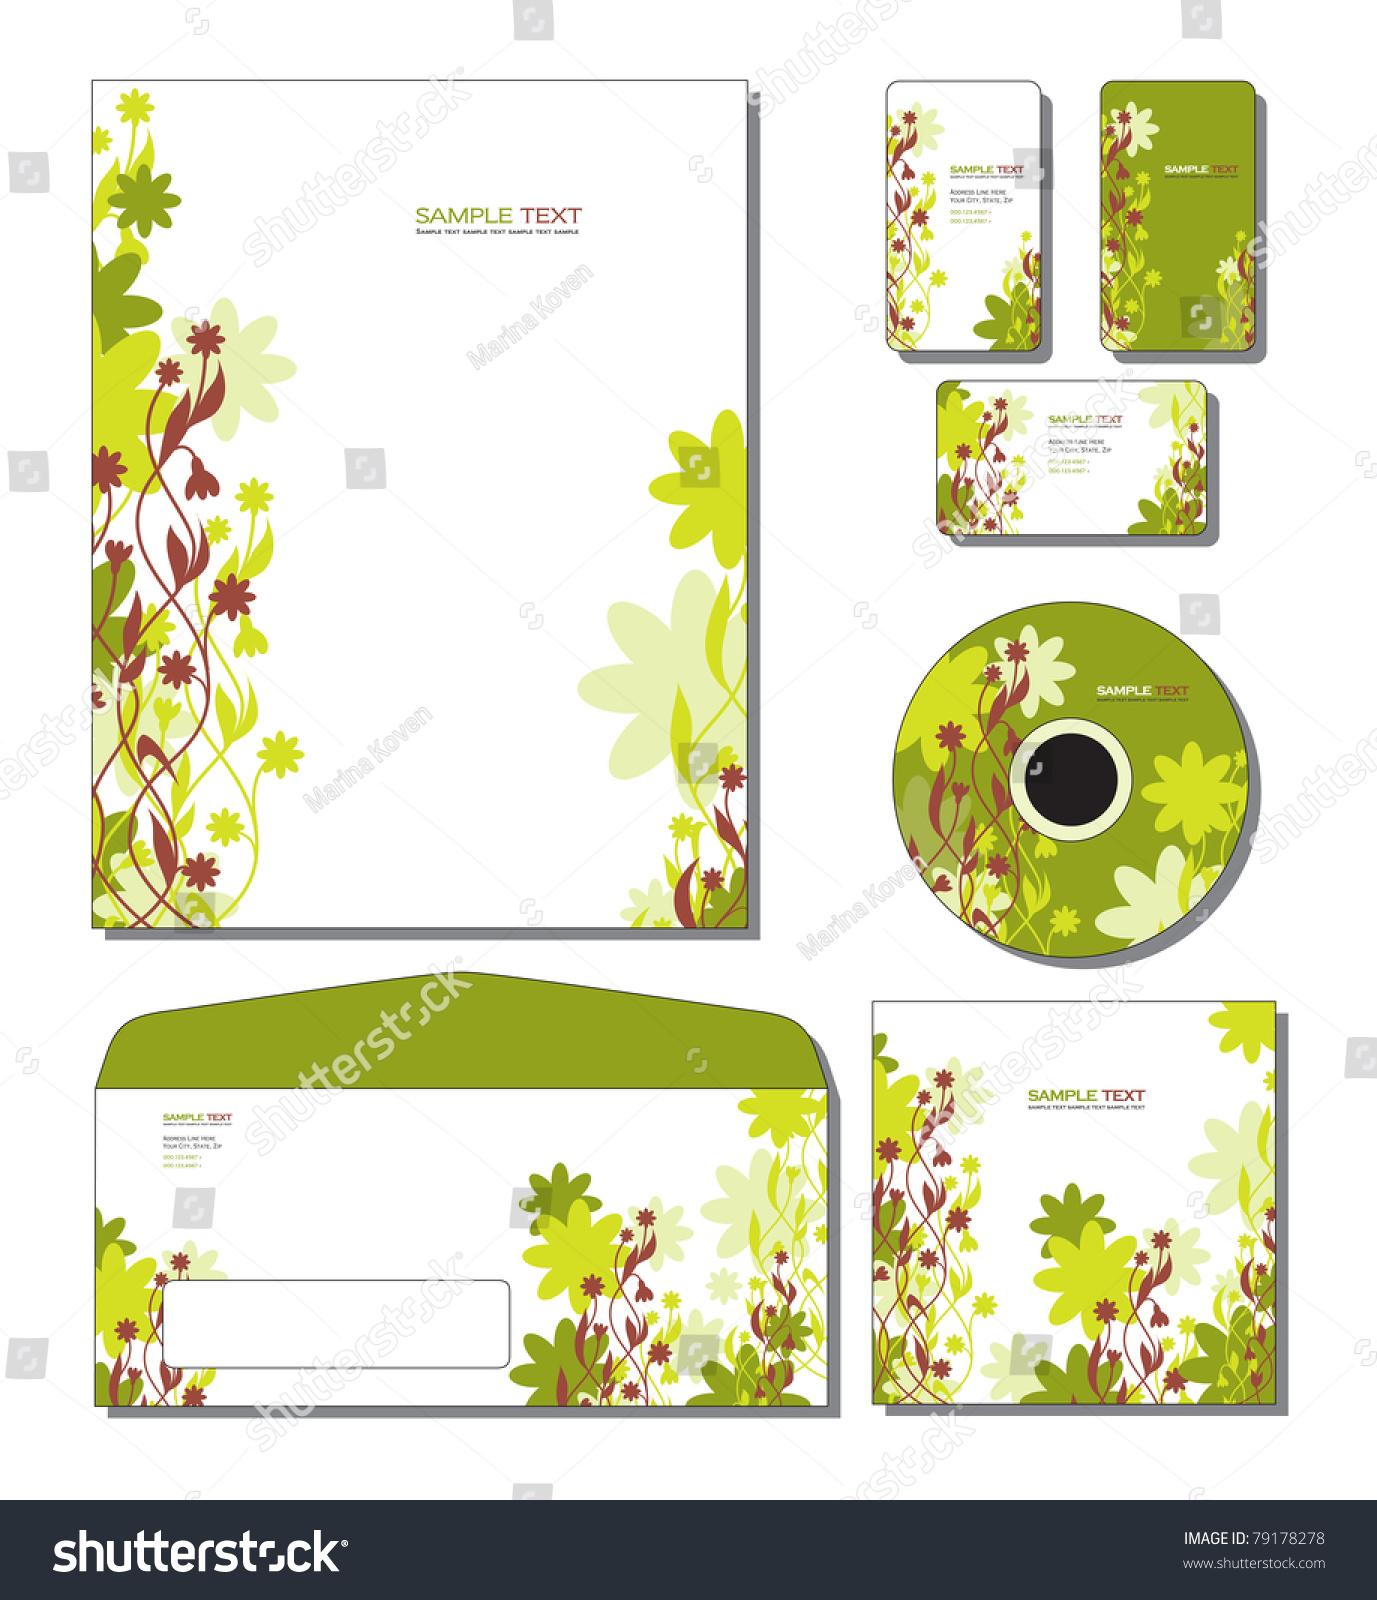 Corporate template vector letterhead business gift stock vector corporate template vector letterhead business and gift cards cd cd cover colourmoves Choice Image